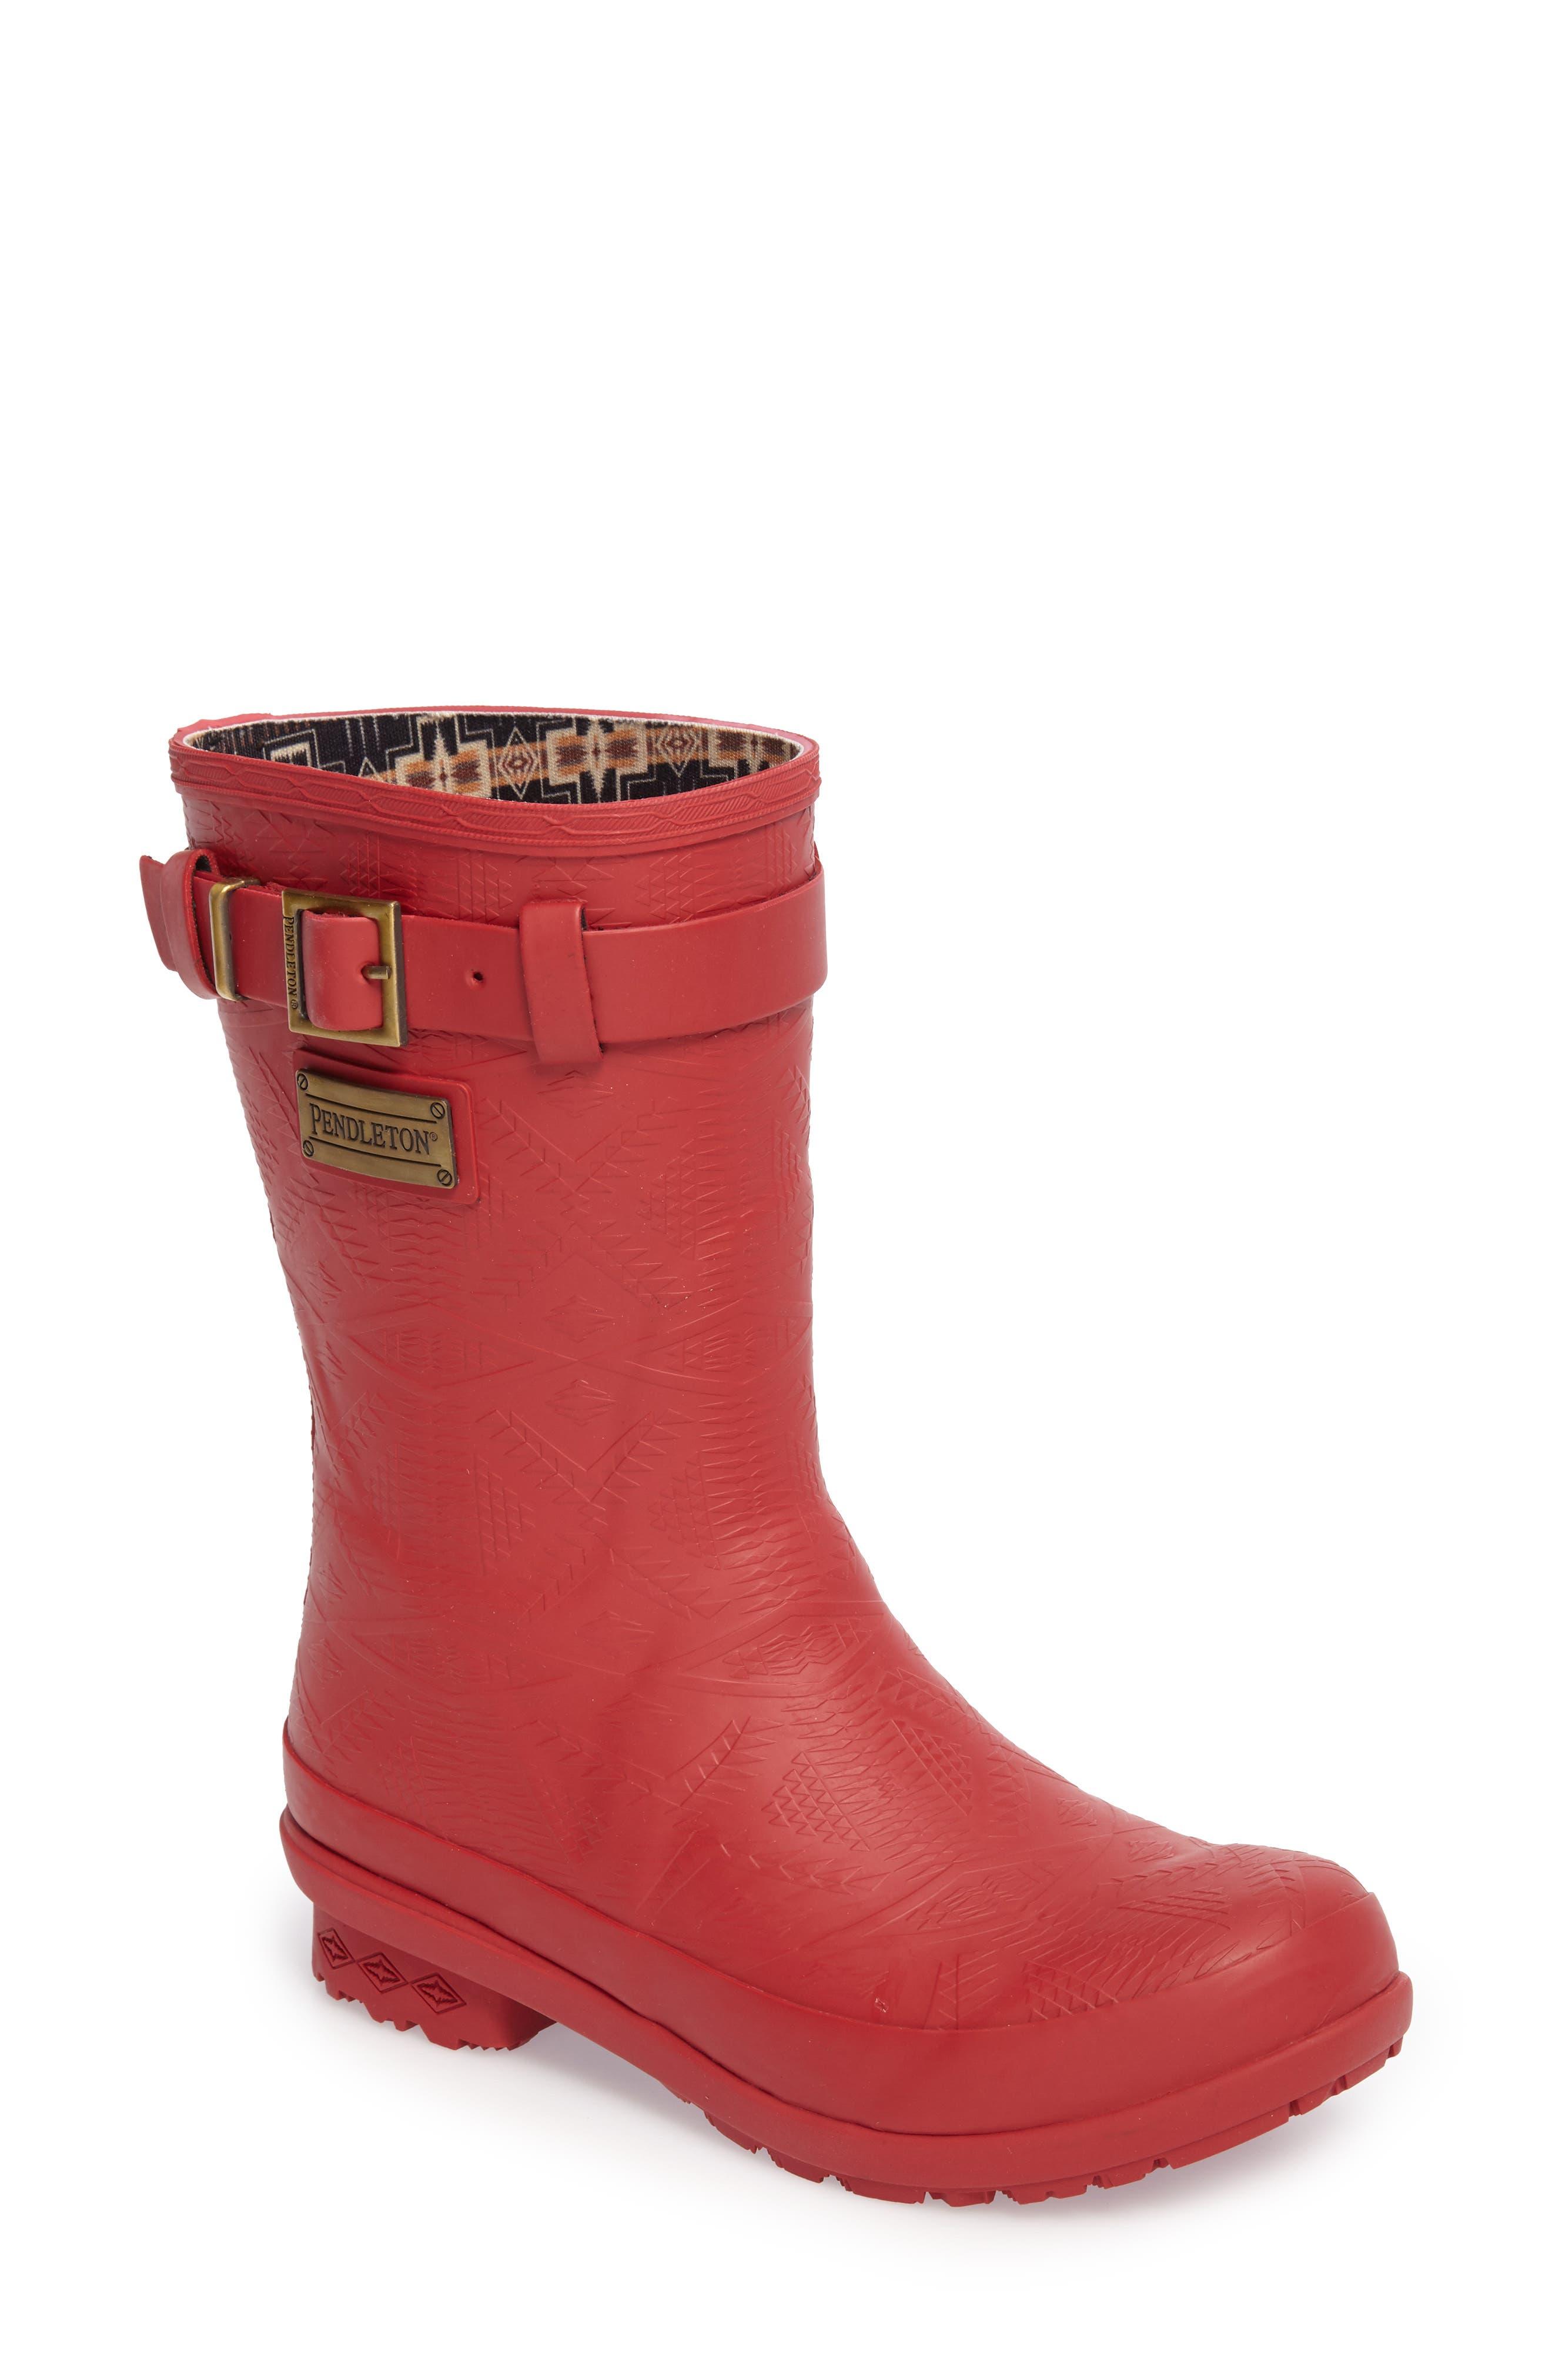 PENDLETON Embossed Short Waterproof Rain Boot, Main, color, SCARLET